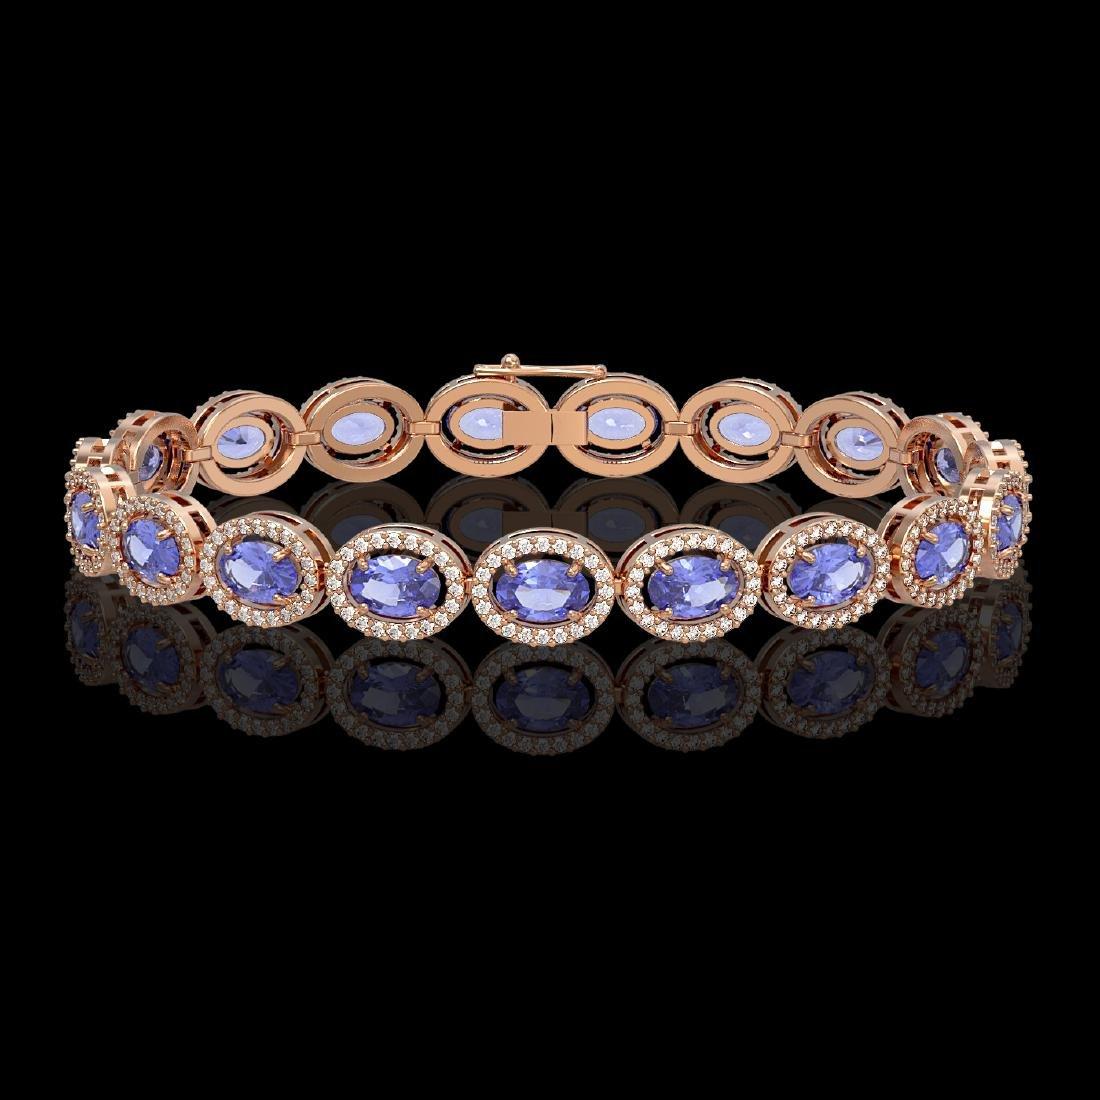 14.25 CTW Tanzanite & Diamond Halo Bracelet 10K Rose